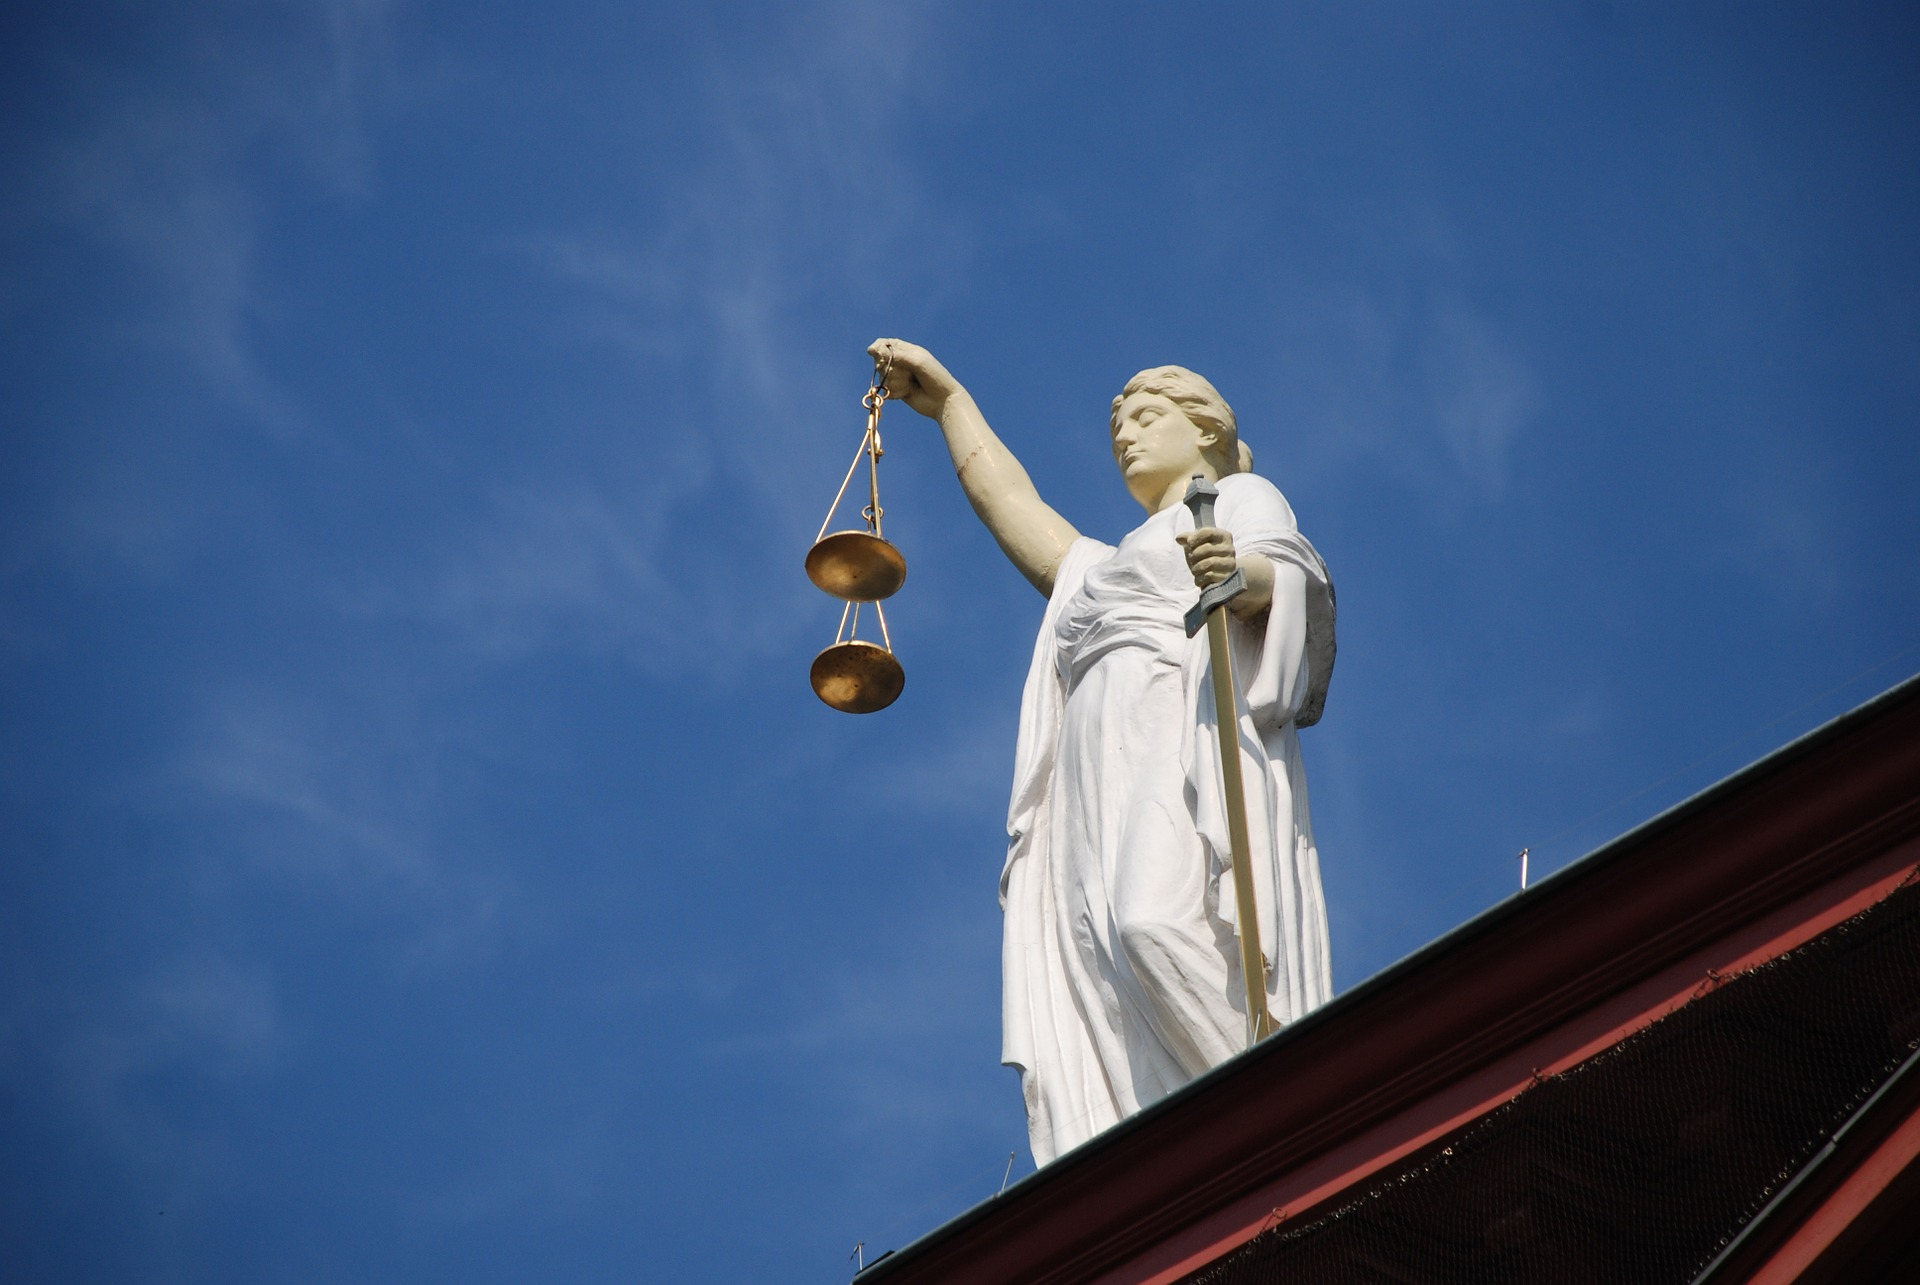 Um direito injusto e nulo